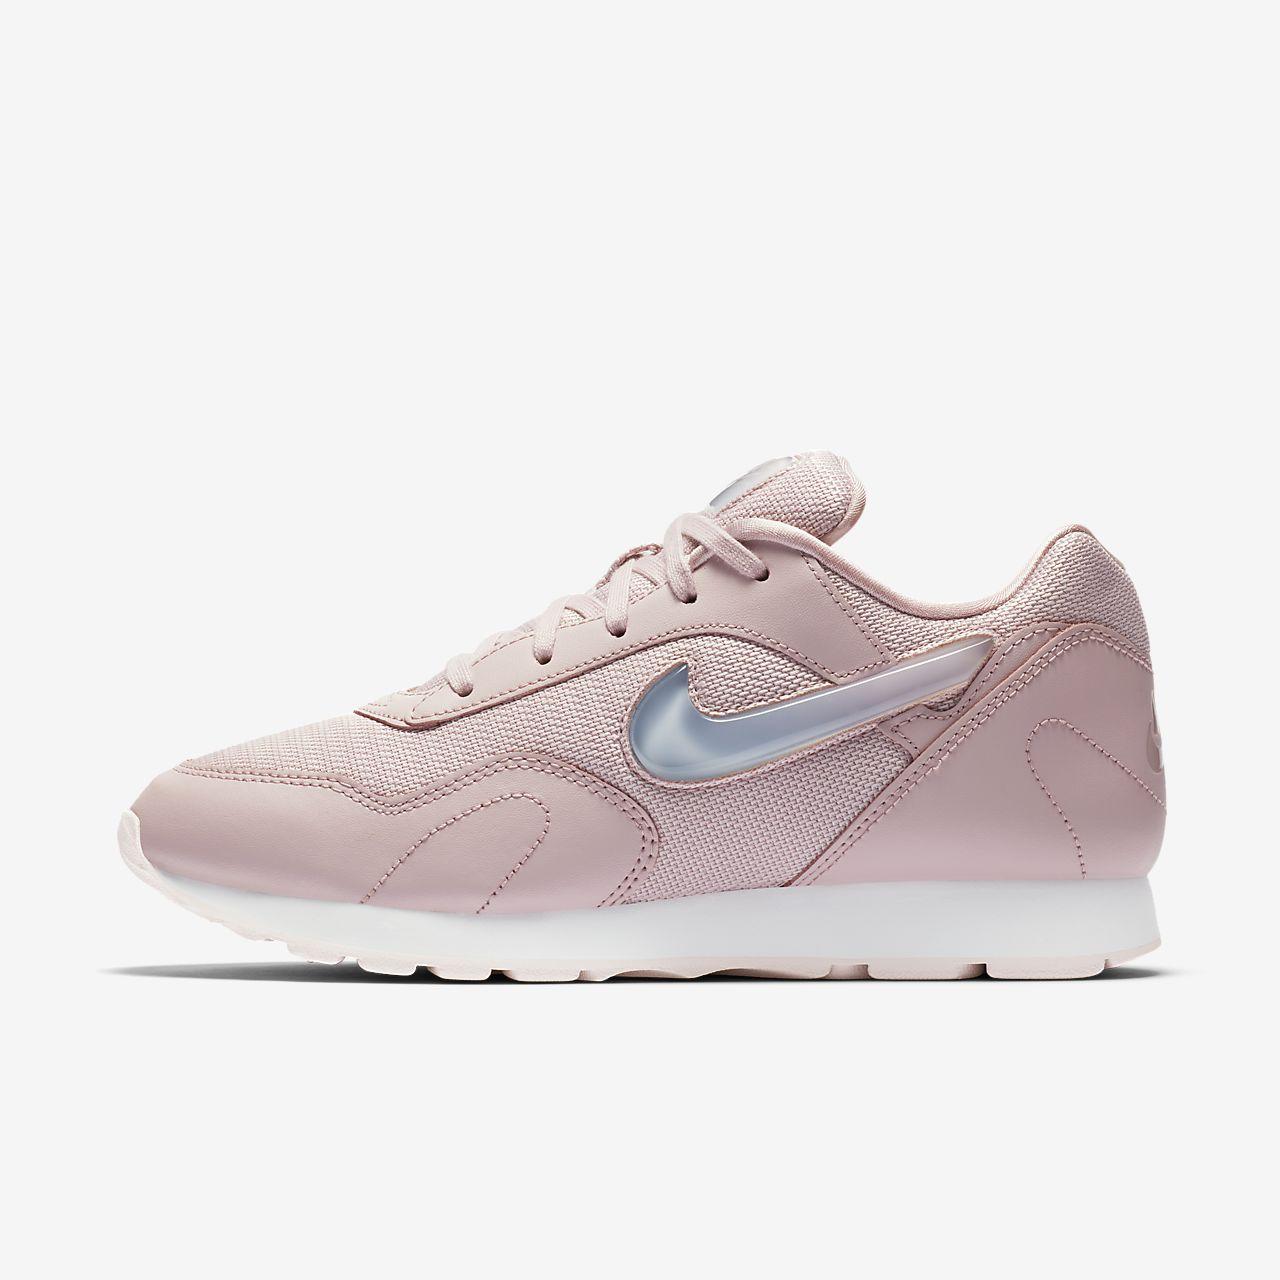 Sko Nike Outburst Premium för kvinnor